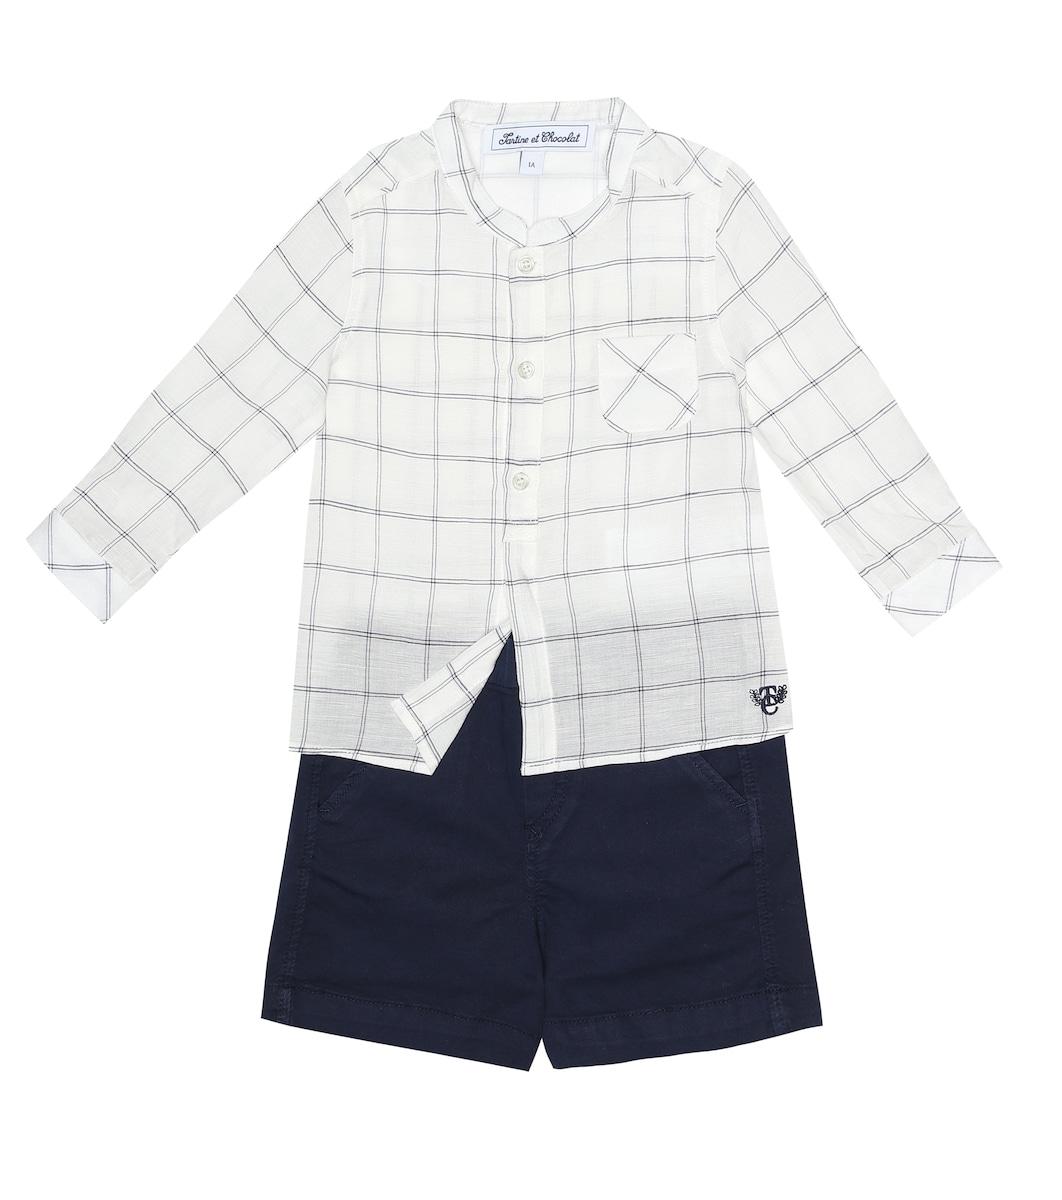 a9b6b5a88 Baby Checked Linen-Blend Shirt | Tartine et Chocolat - Mytheresa